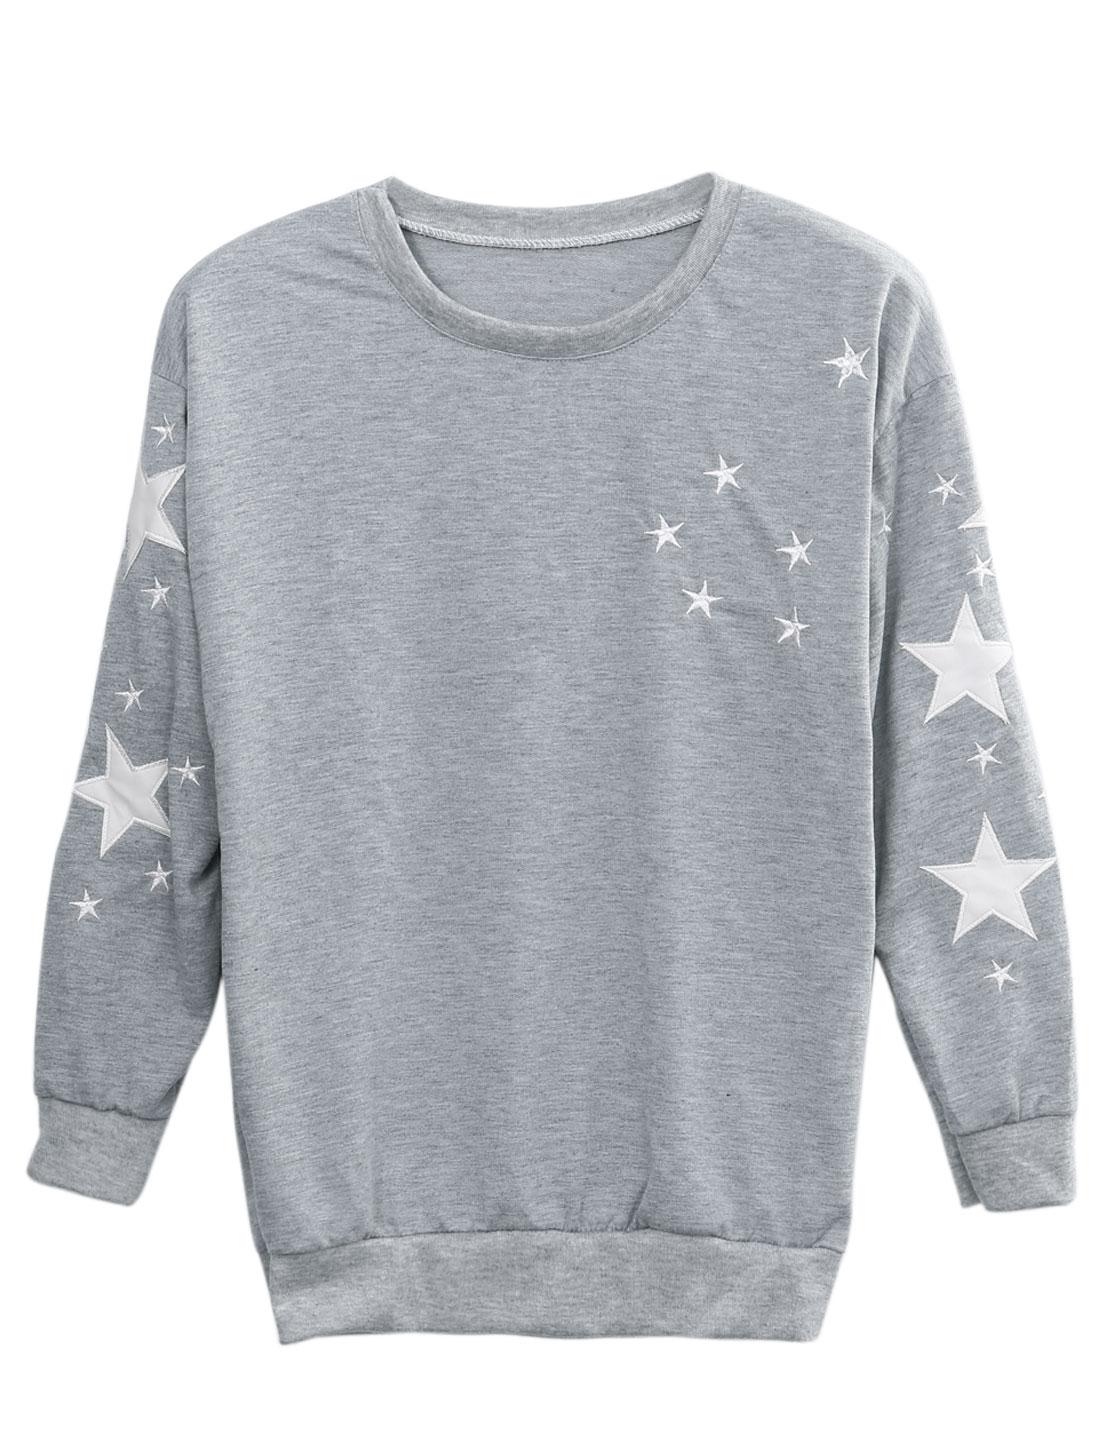 Lady Stars Pattern Round Neck Ribbed Hem Leisure Sweatshirt Light Gray XS